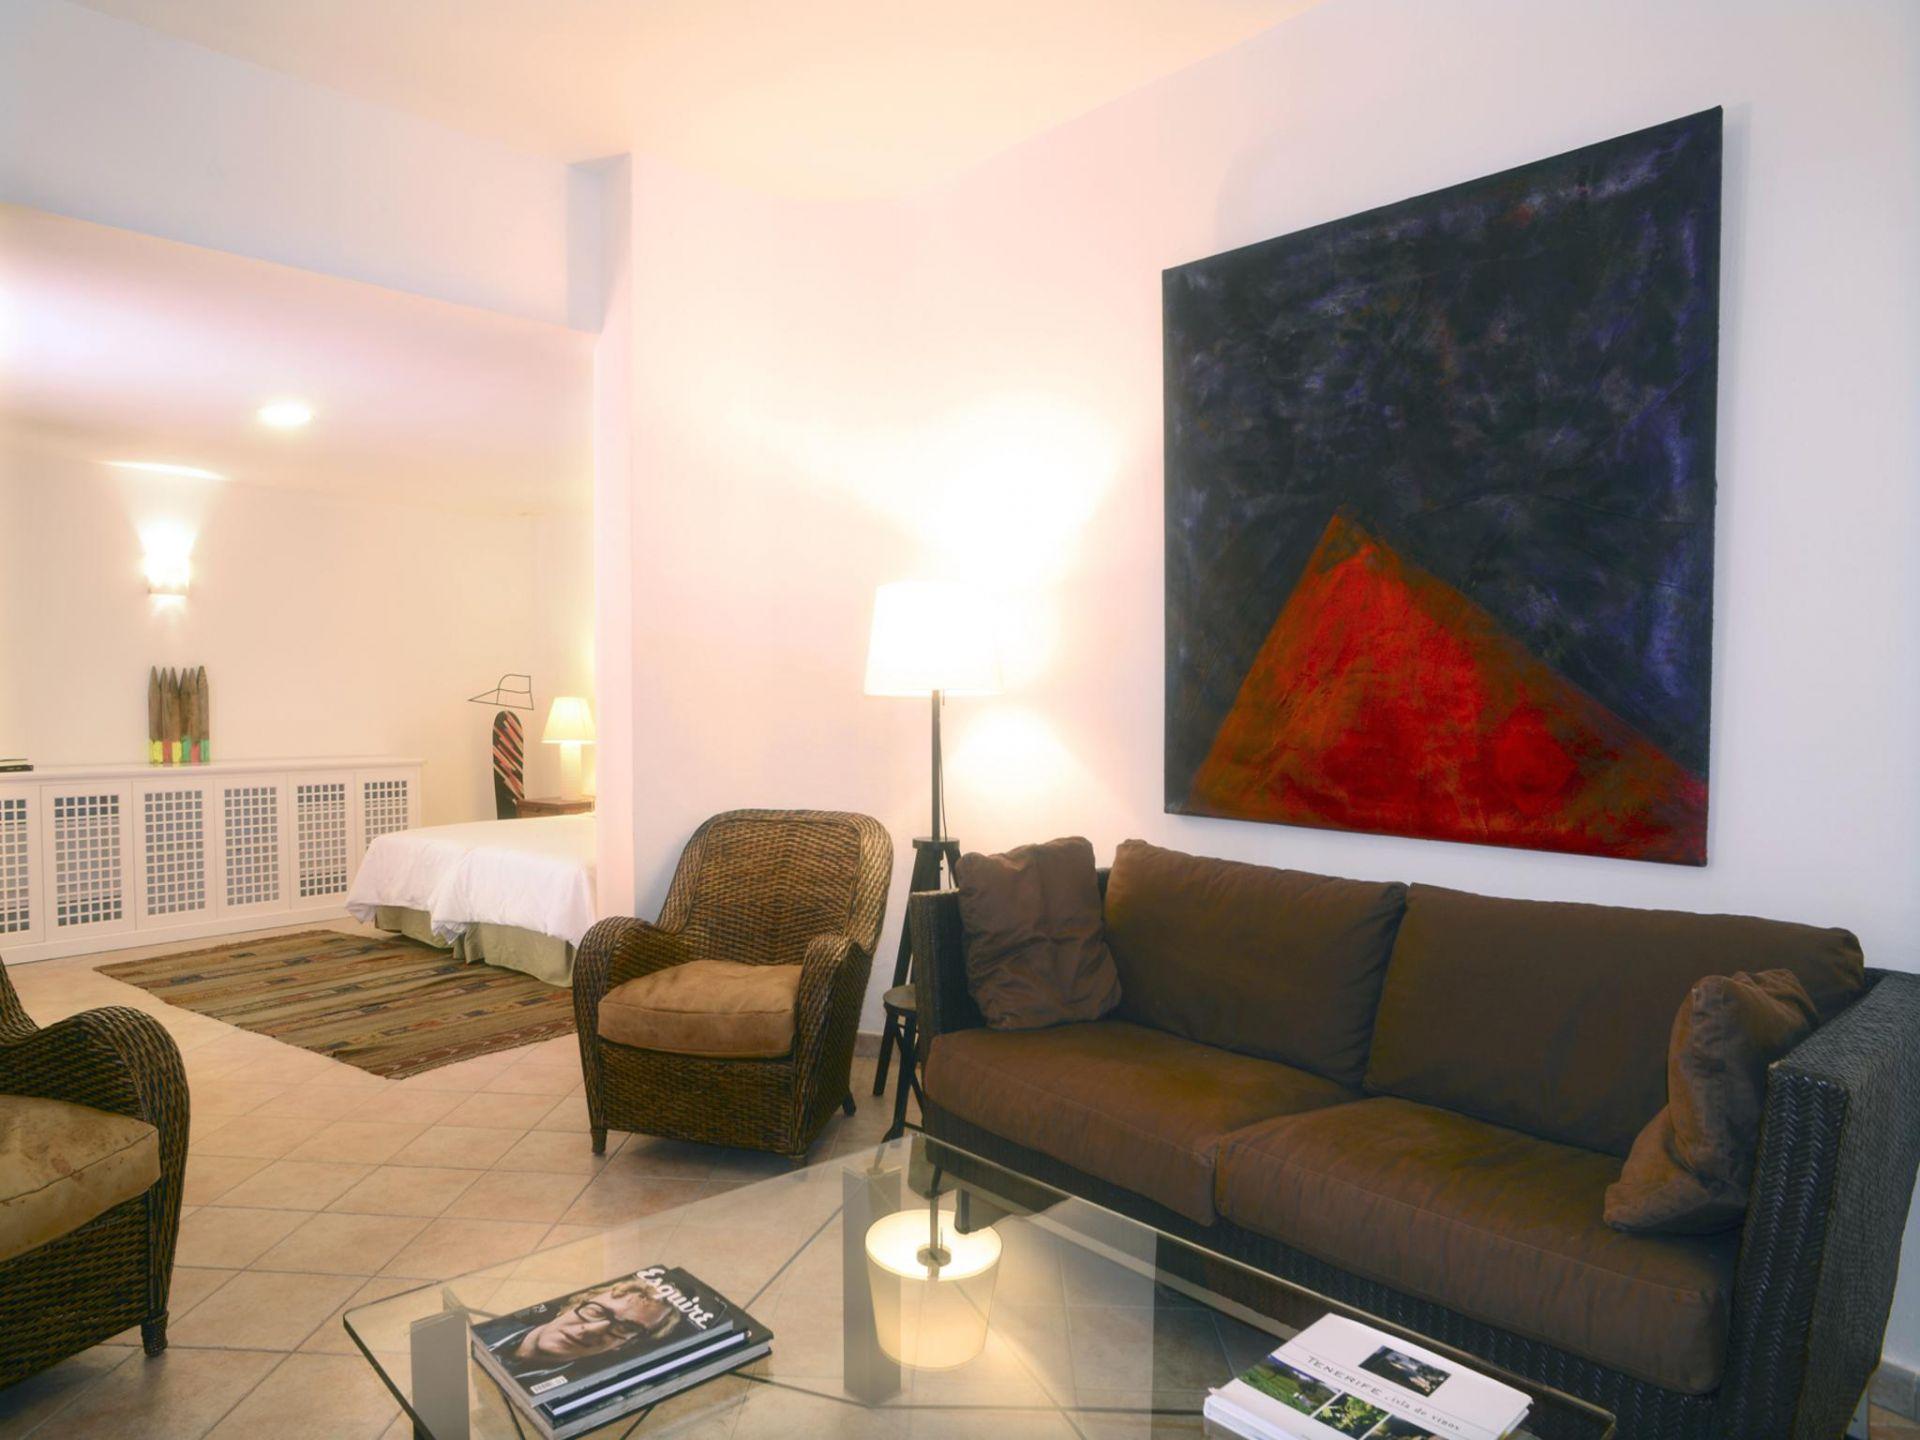 Holiday apartment Villa San Agustin 10 - Holiday Rental (854295), Maspalomas, Gran Canaria, Canary Islands, Spain, picture 28